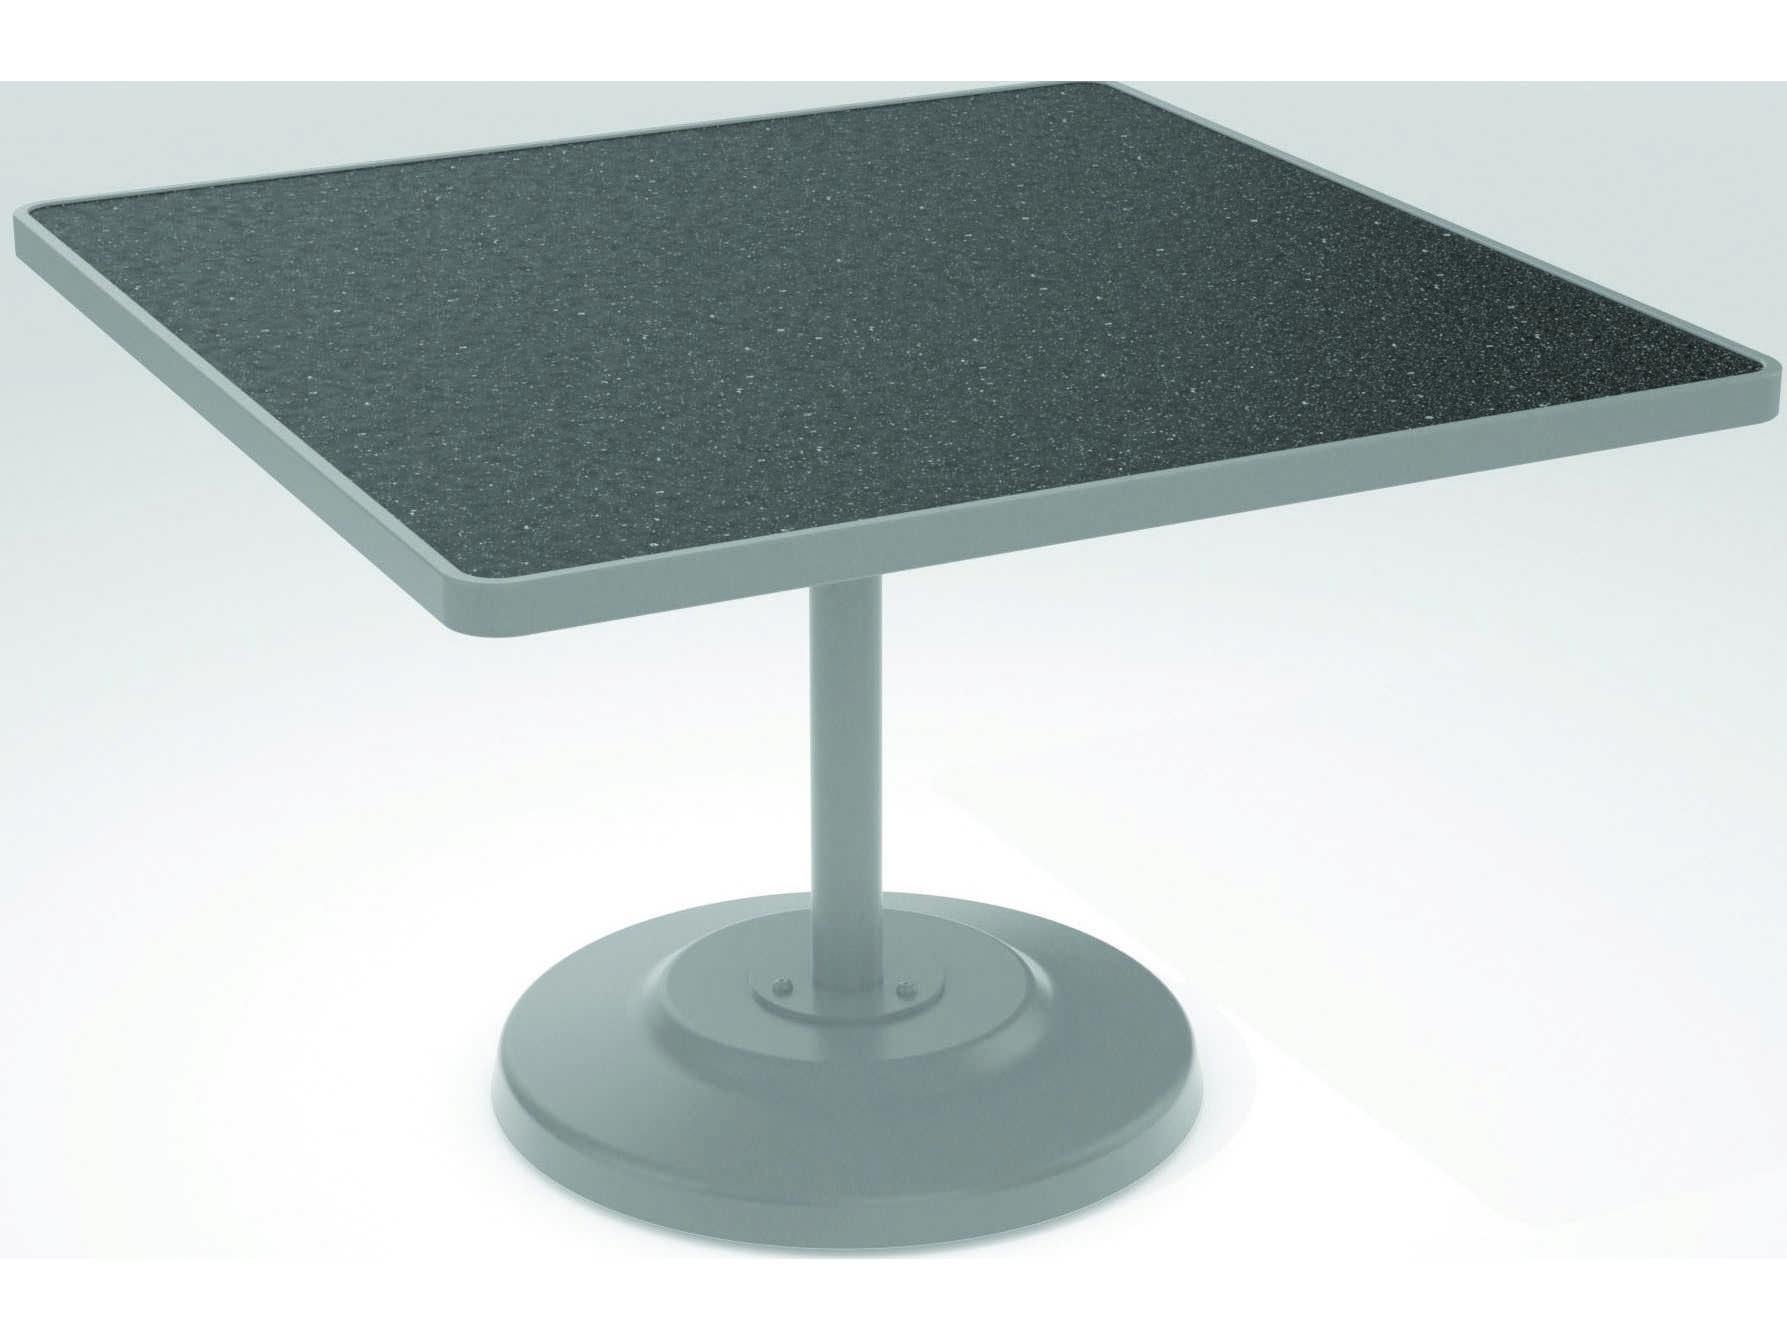 Tropitone Hpl Raduno Aluminum 42 Square Kd Pedestal Table 701443h